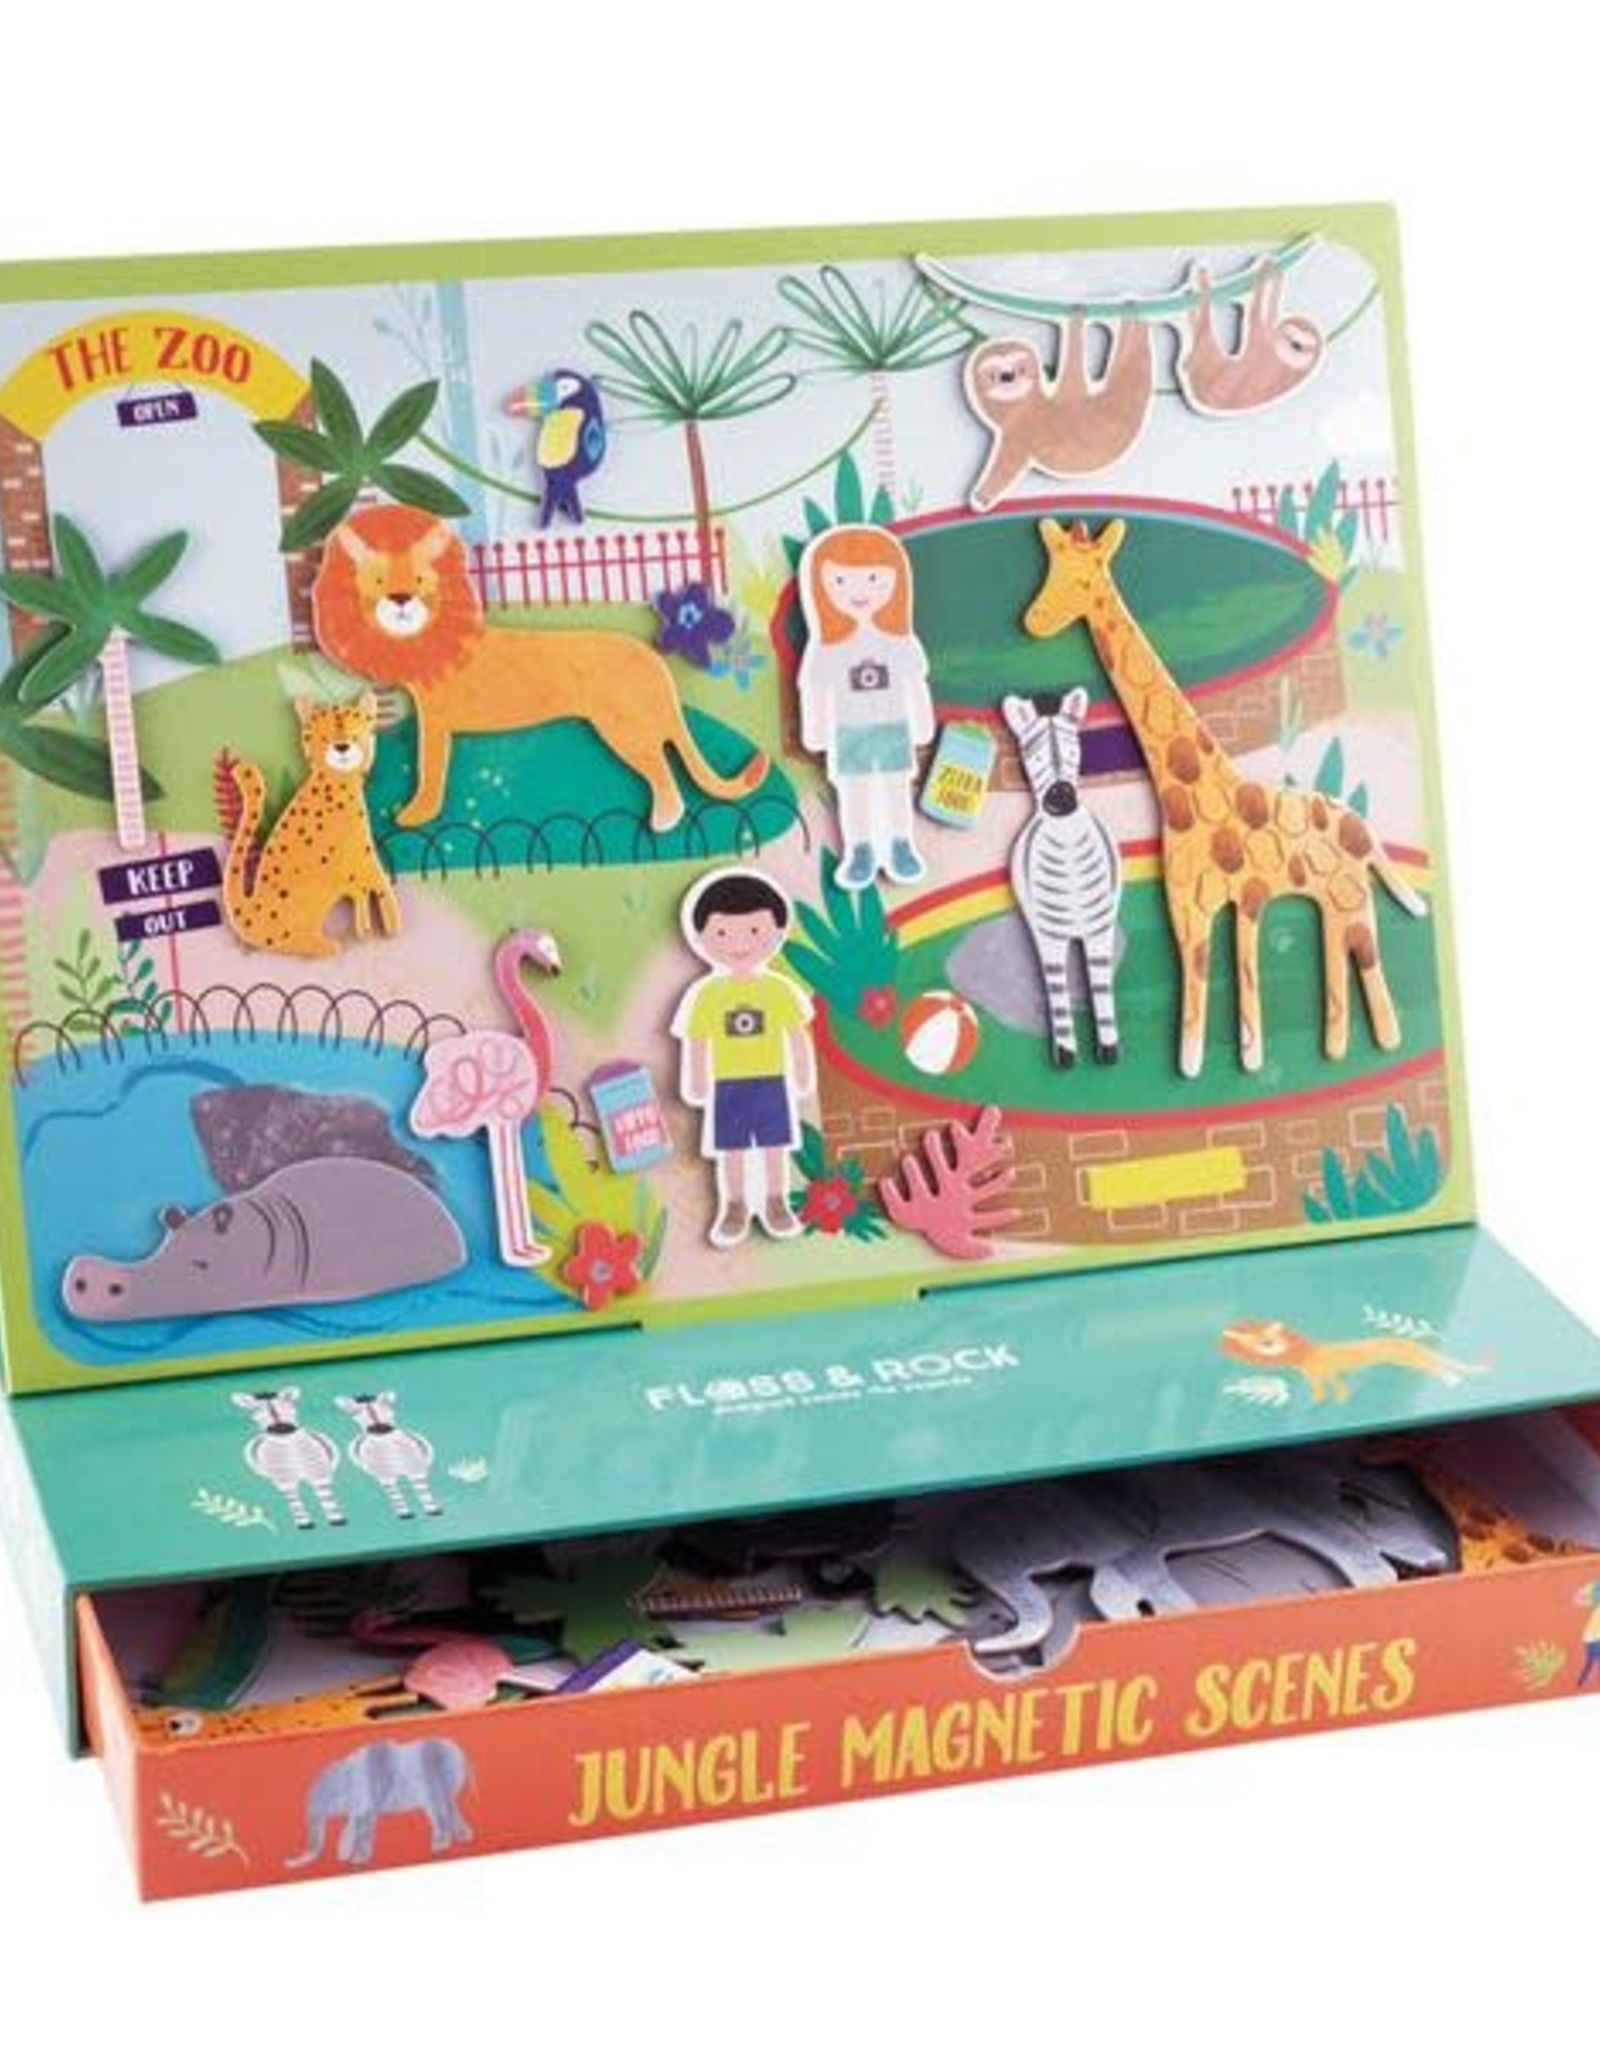 Floss & Rock Jungle Magnetic Scenes